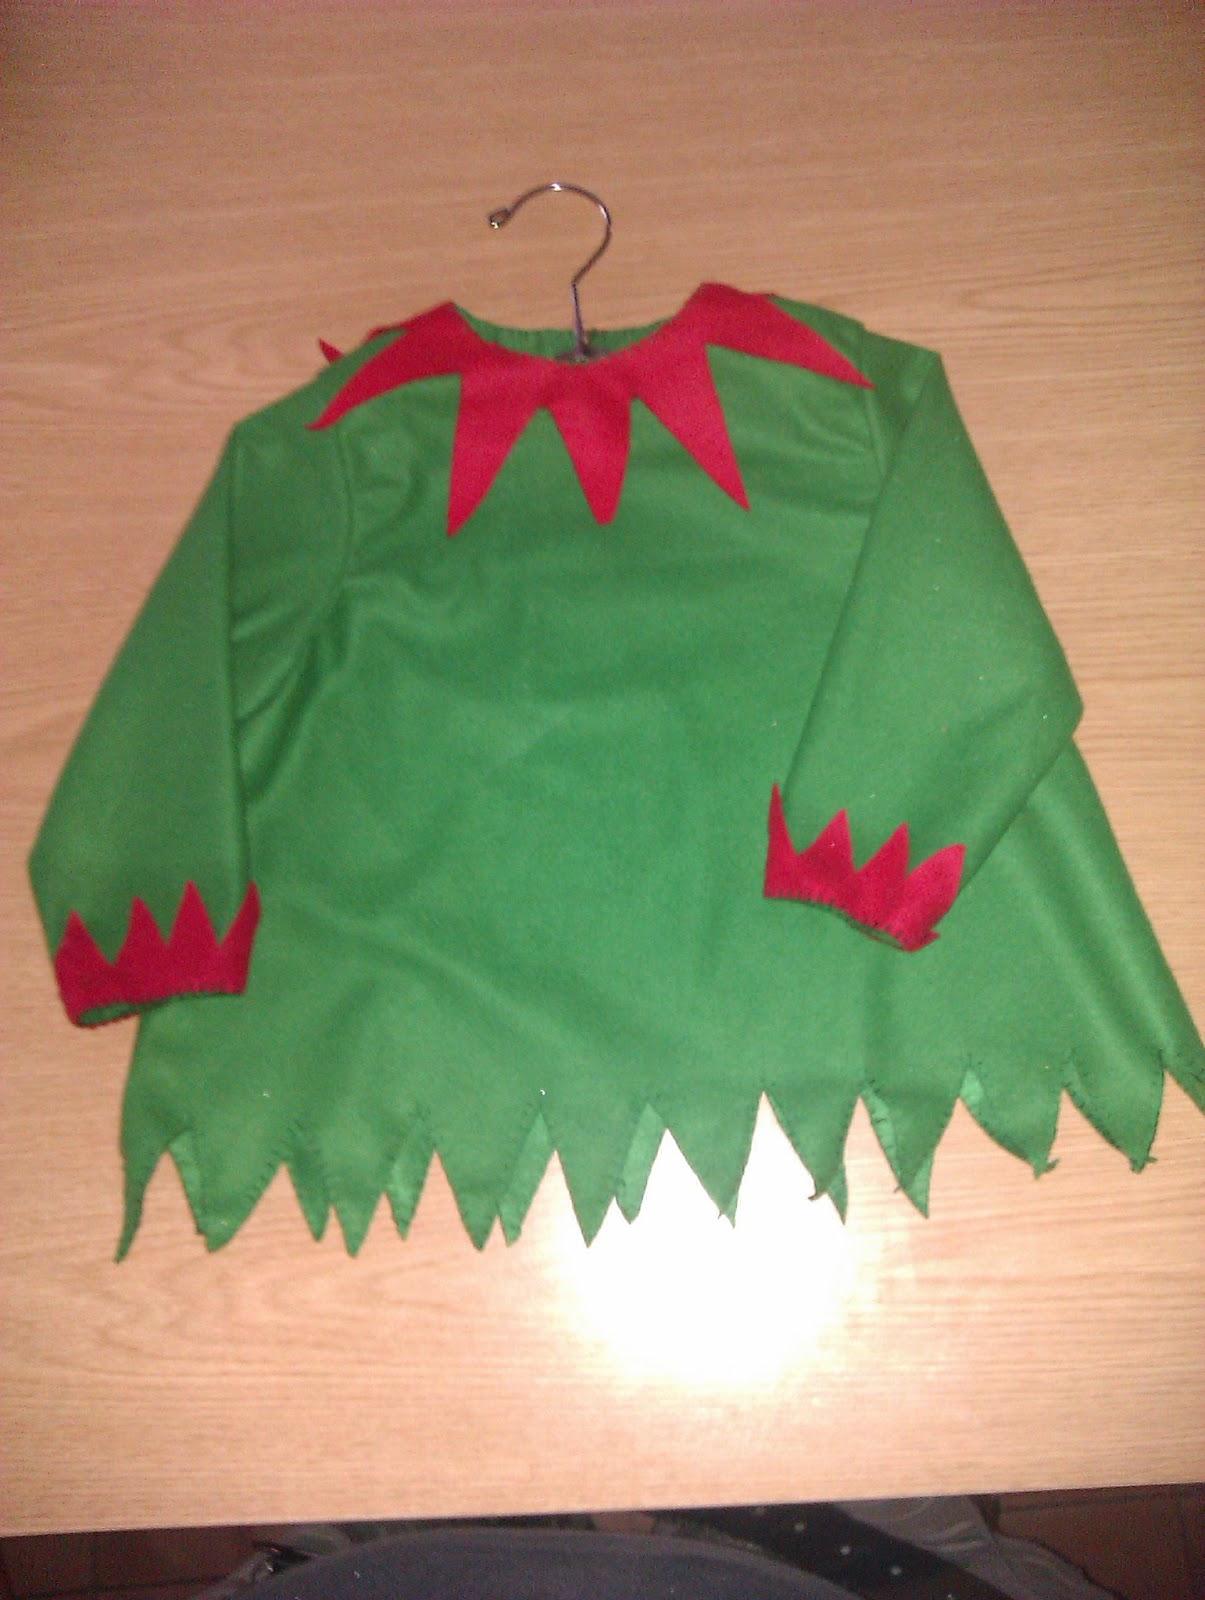 El taller de costura de mj traje de duende navide o - Traje de duende para nino ...